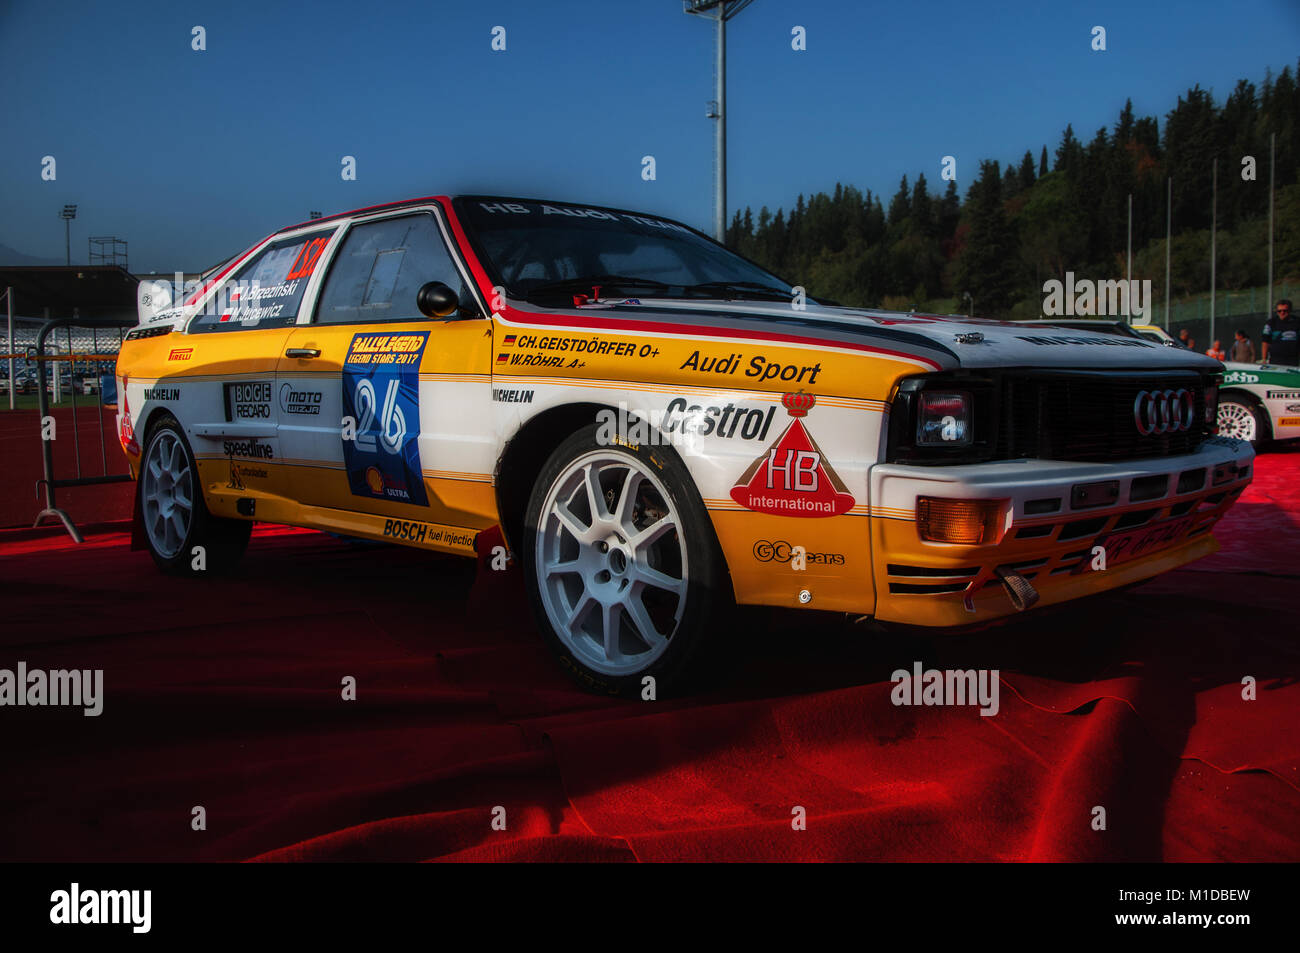 classic audi quattro rally car stock photos classic audi. Black Bedroom Furniture Sets. Home Design Ideas